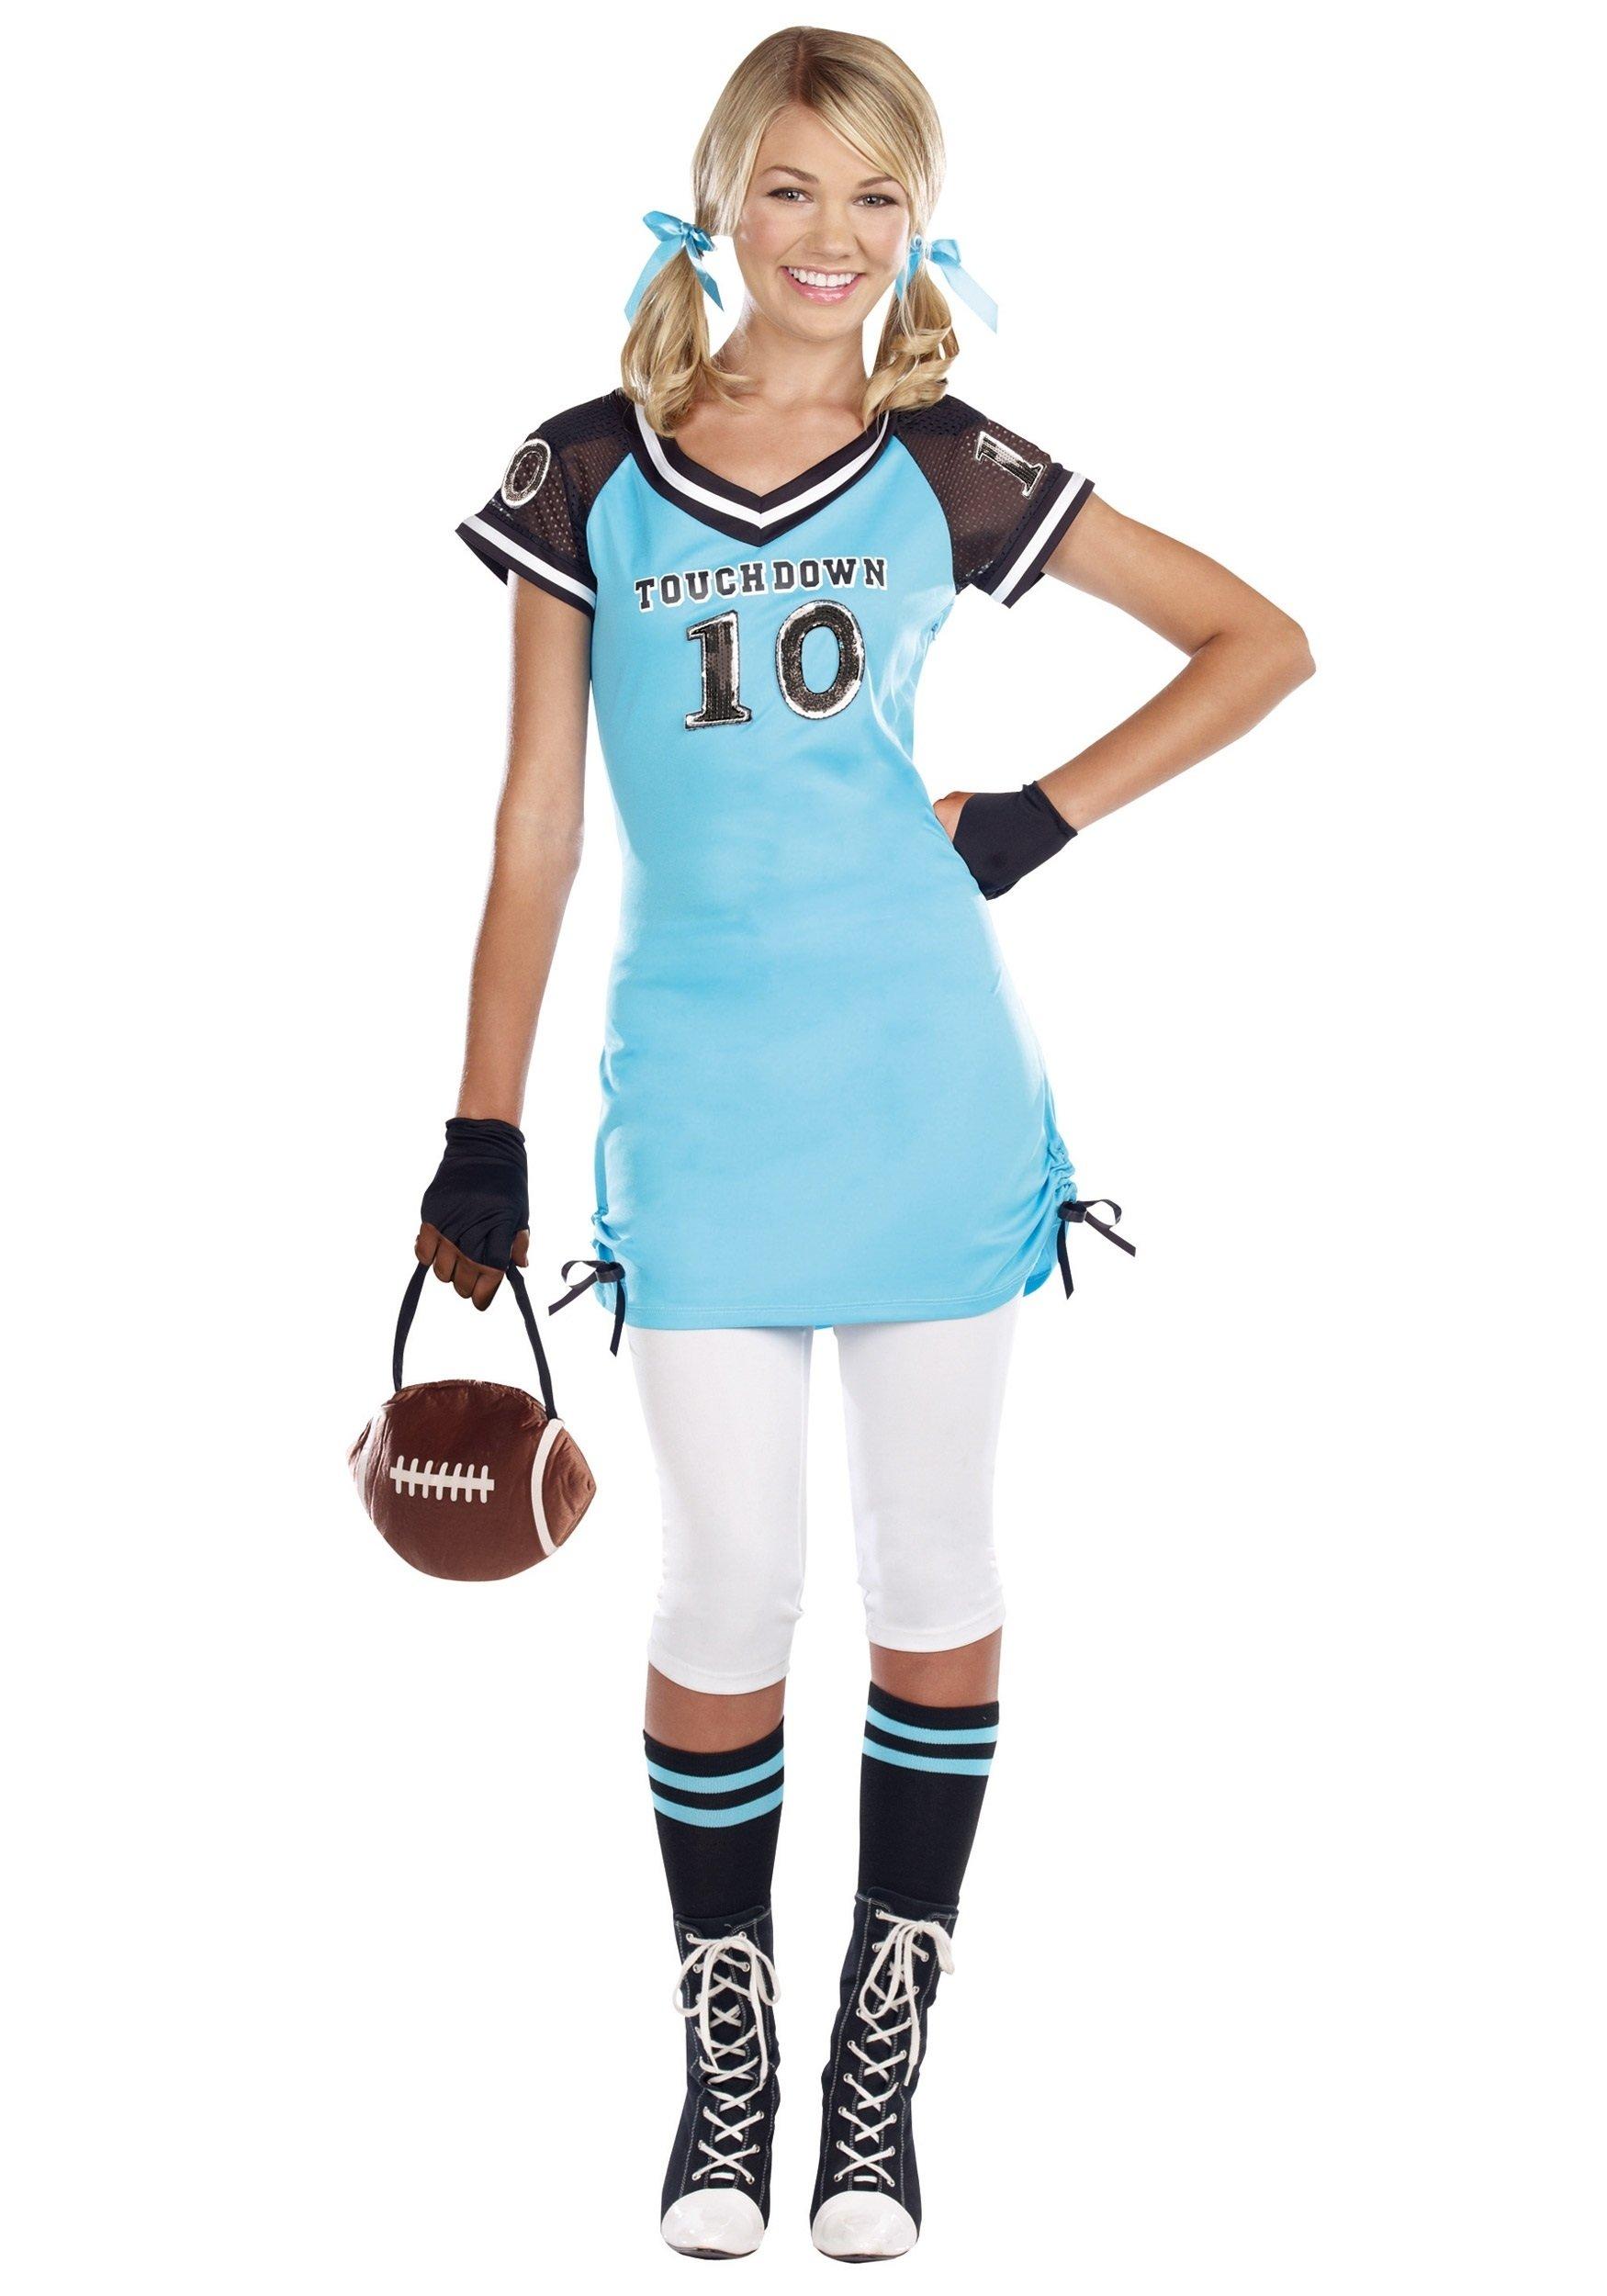 10 Famous Halloween Costume Ideas Teenage Girl teen touchdown cutie costume halloween costumes 2020